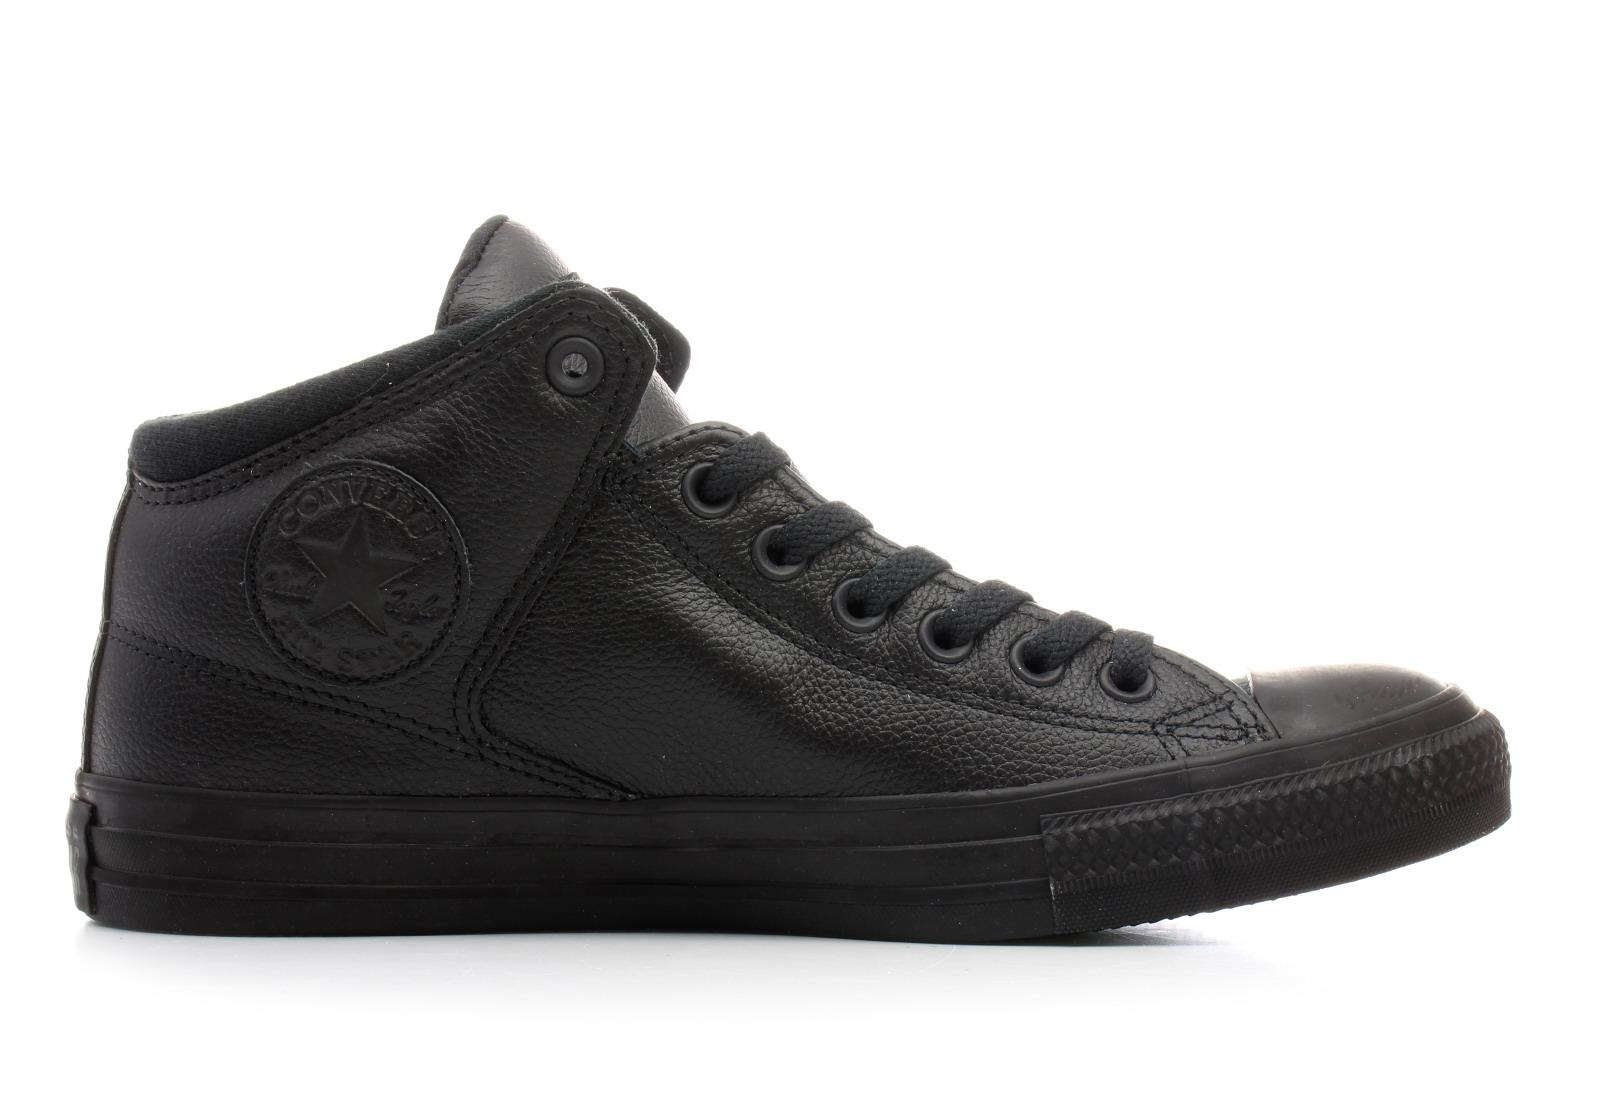 Converse Chuck Taylor All Star High Street Leather Hi Shoe